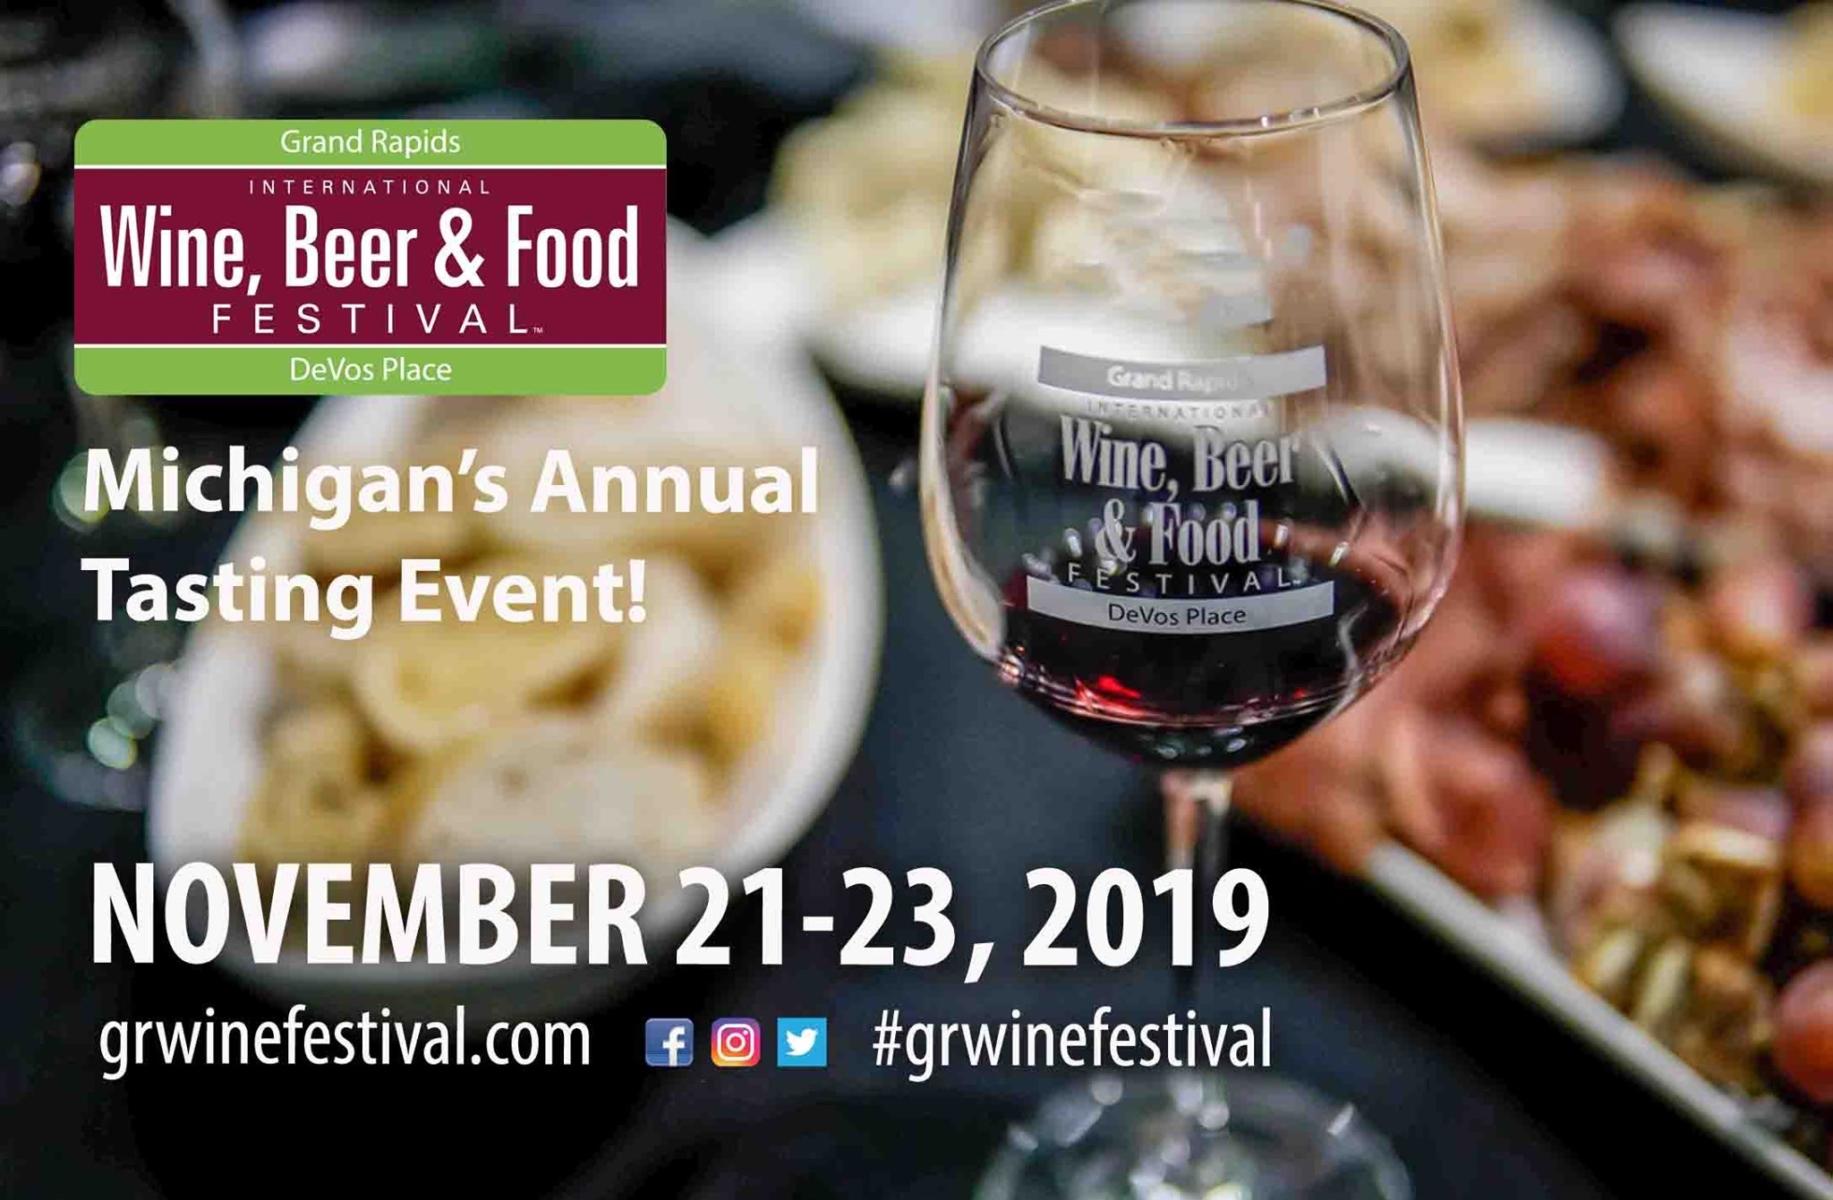 gr wine beer & food fest